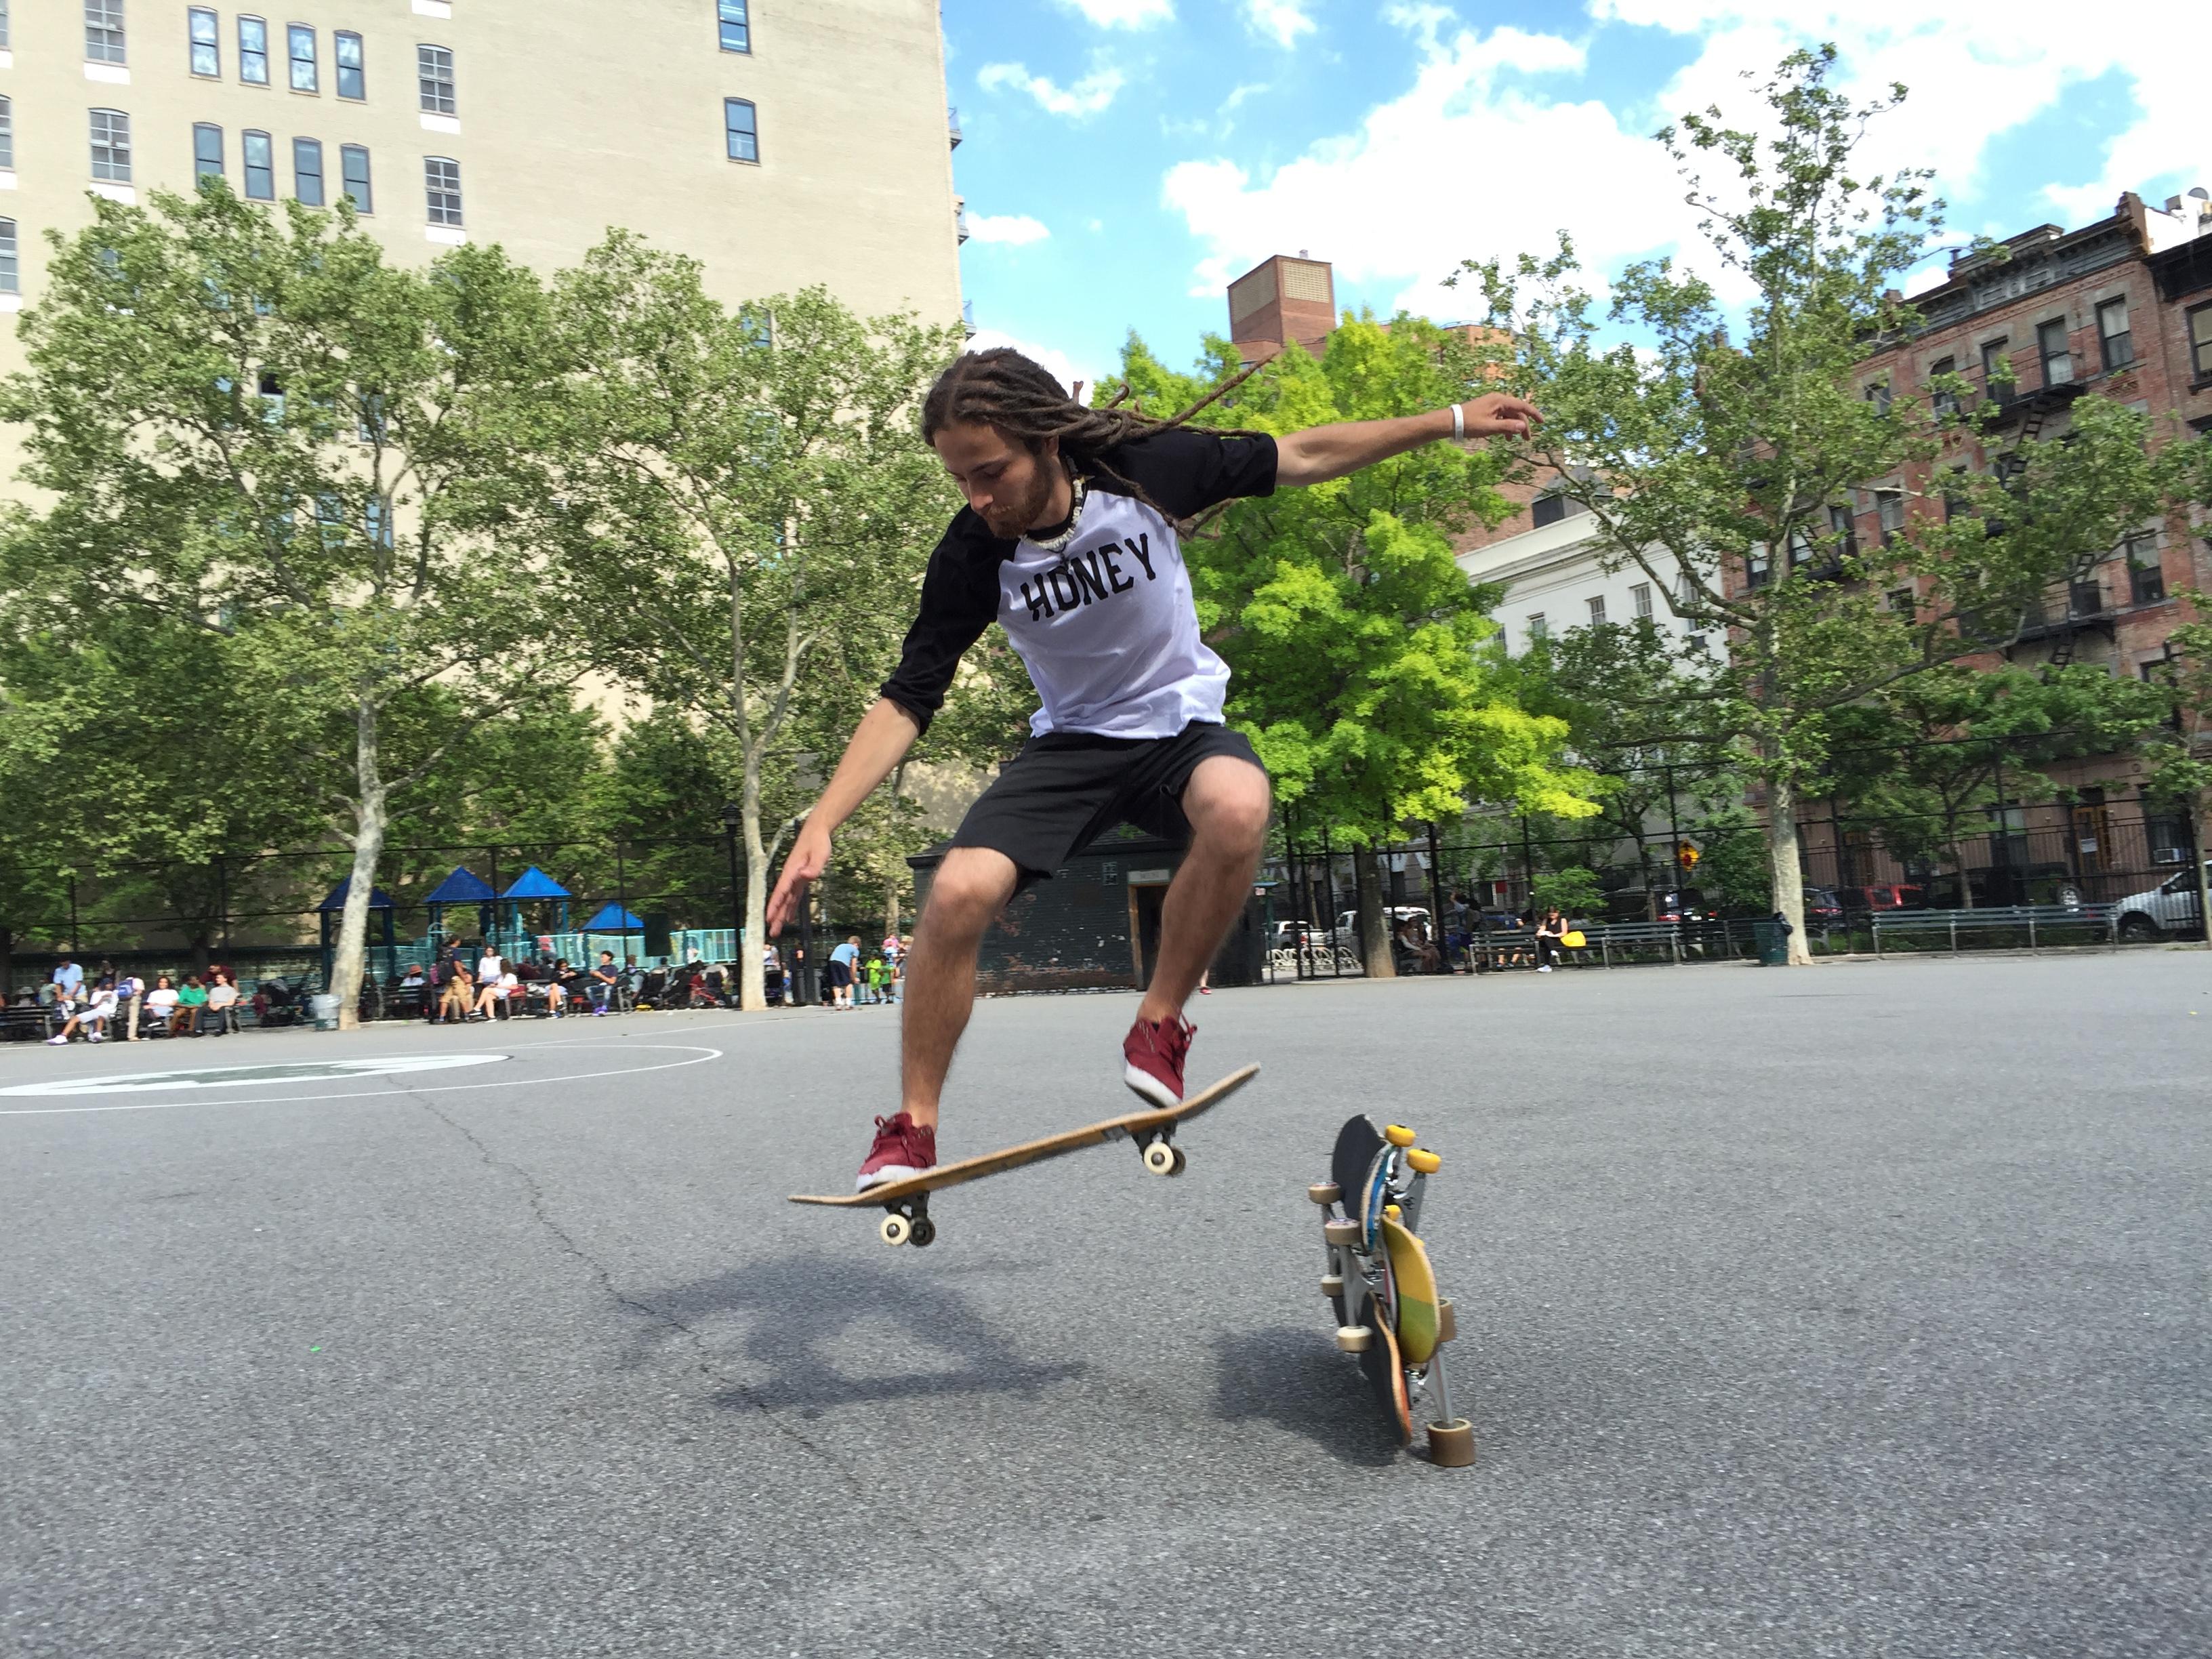 skateboard_ollie_teacher_8